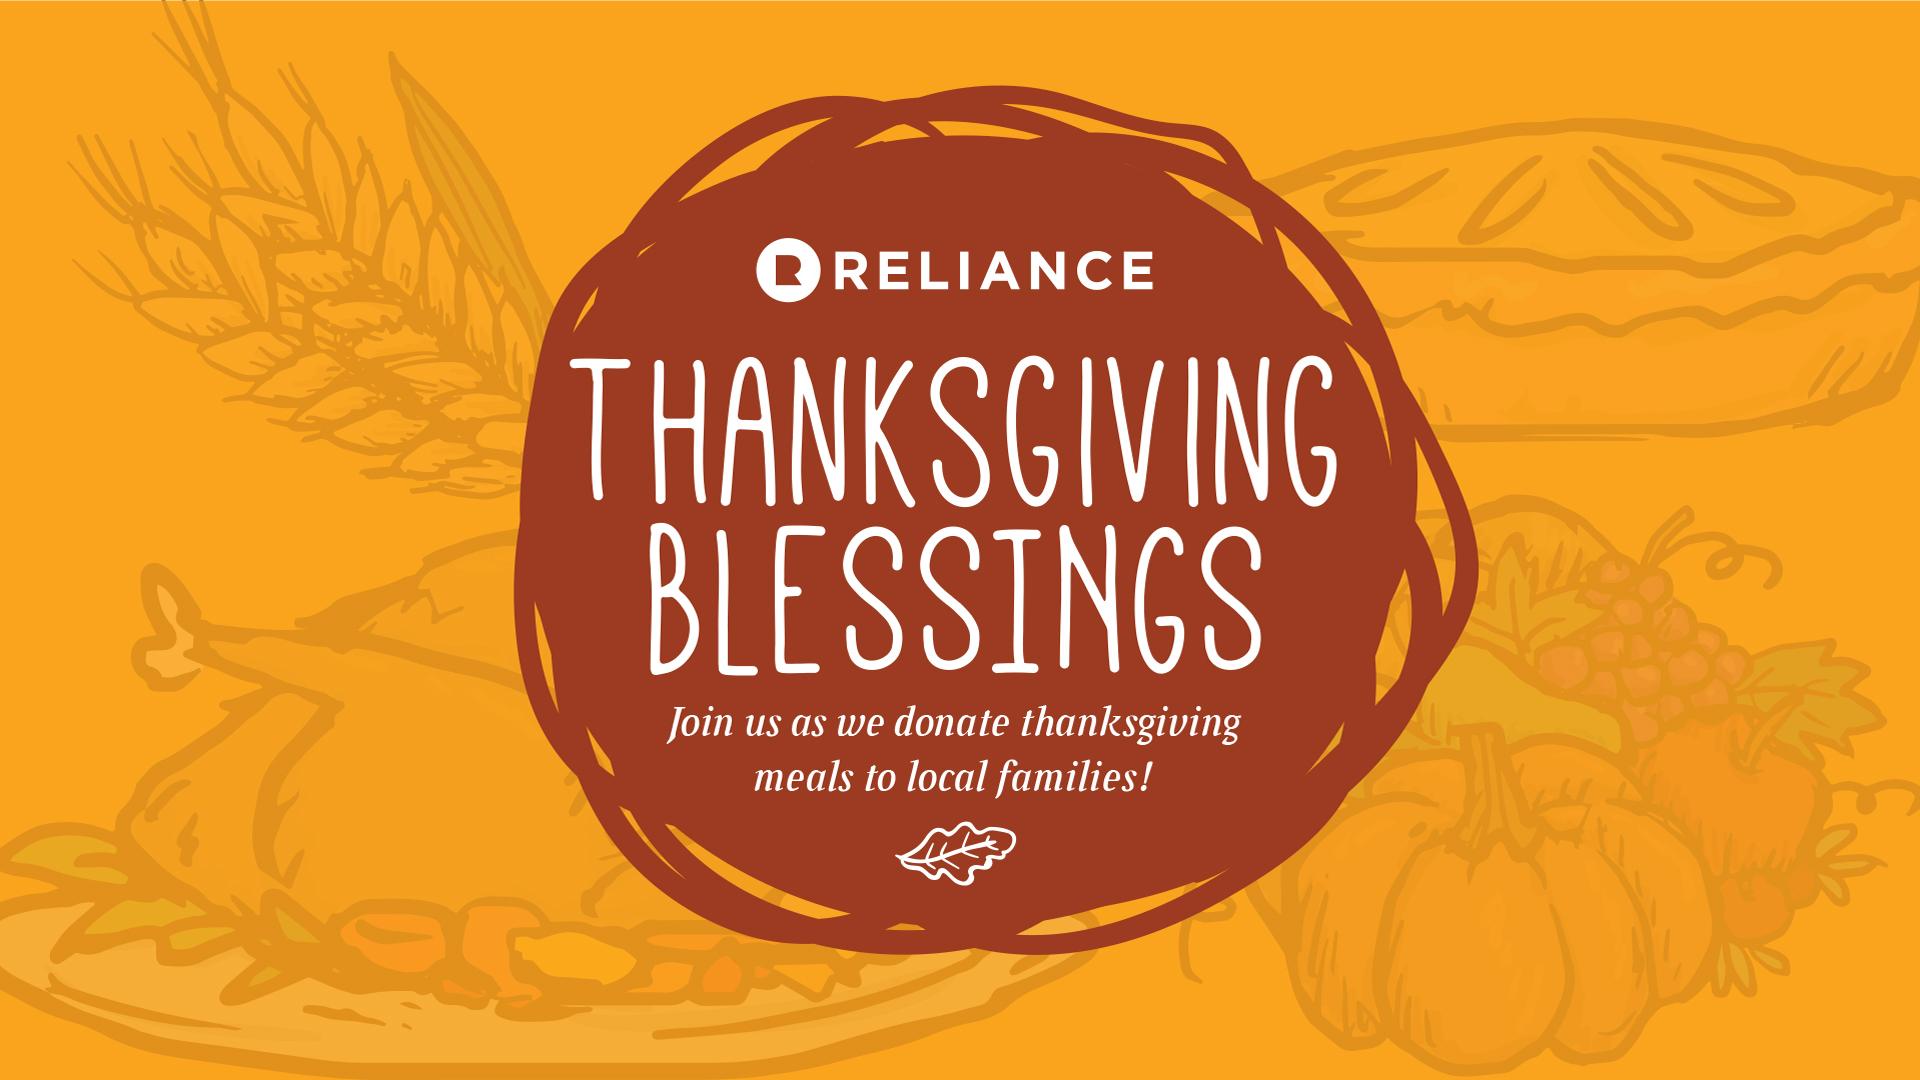 ThanksgivingBlessigns_slide